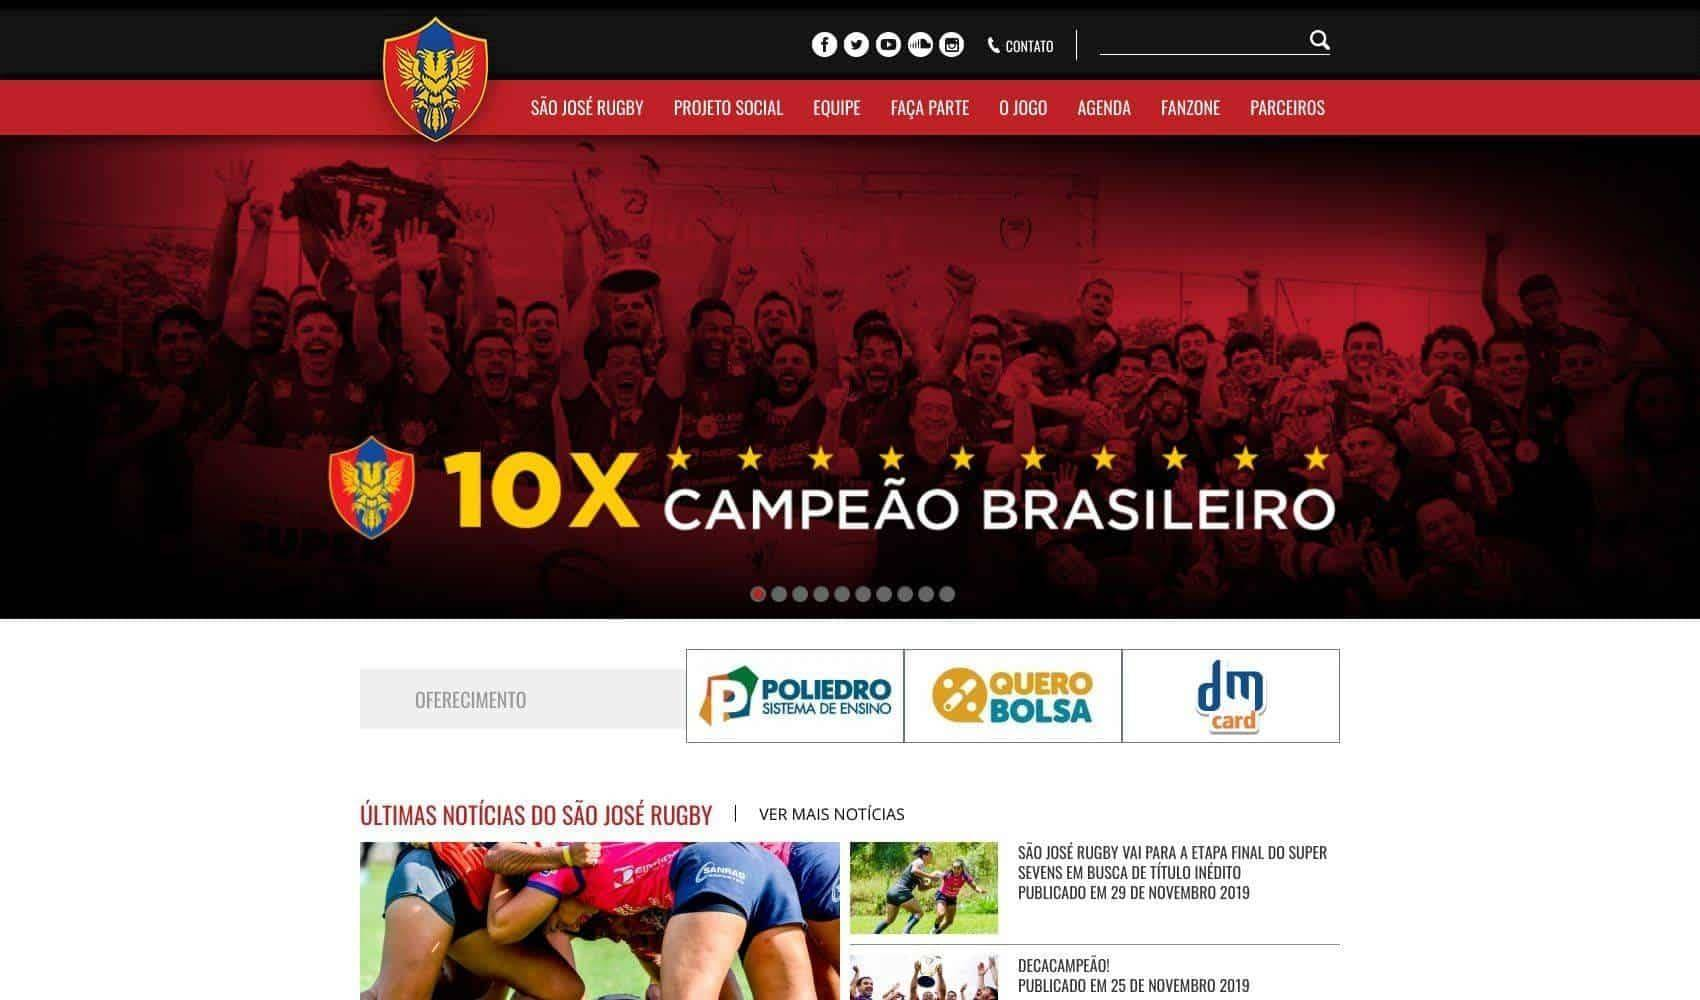 São José Rugby Clube